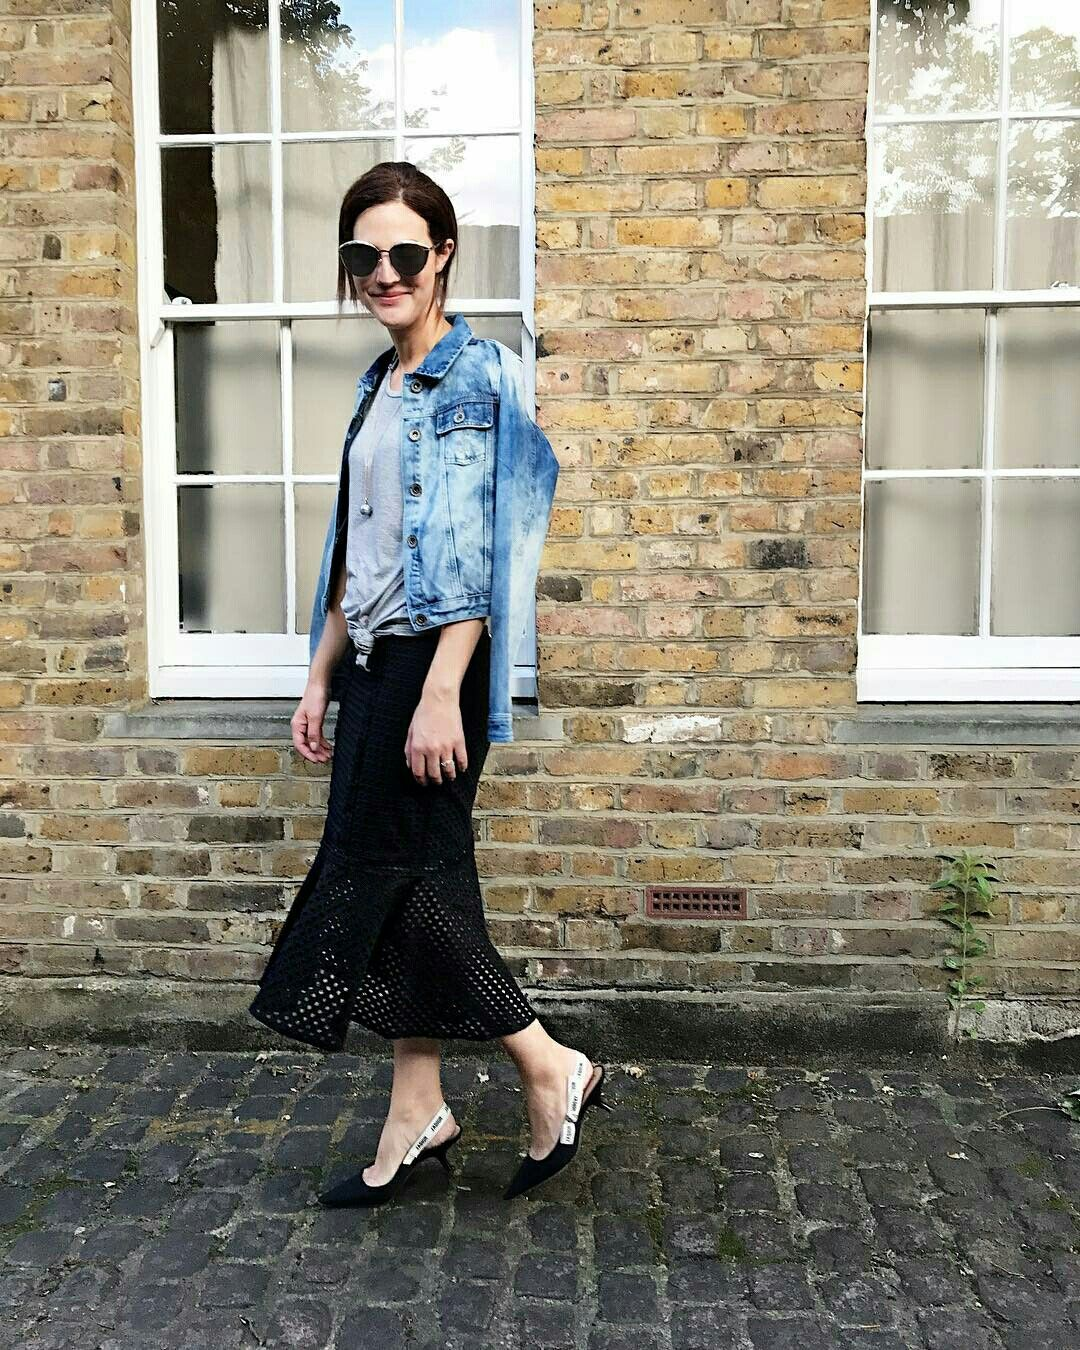 Saia com transparência e jaqueta jeans @vicceridono